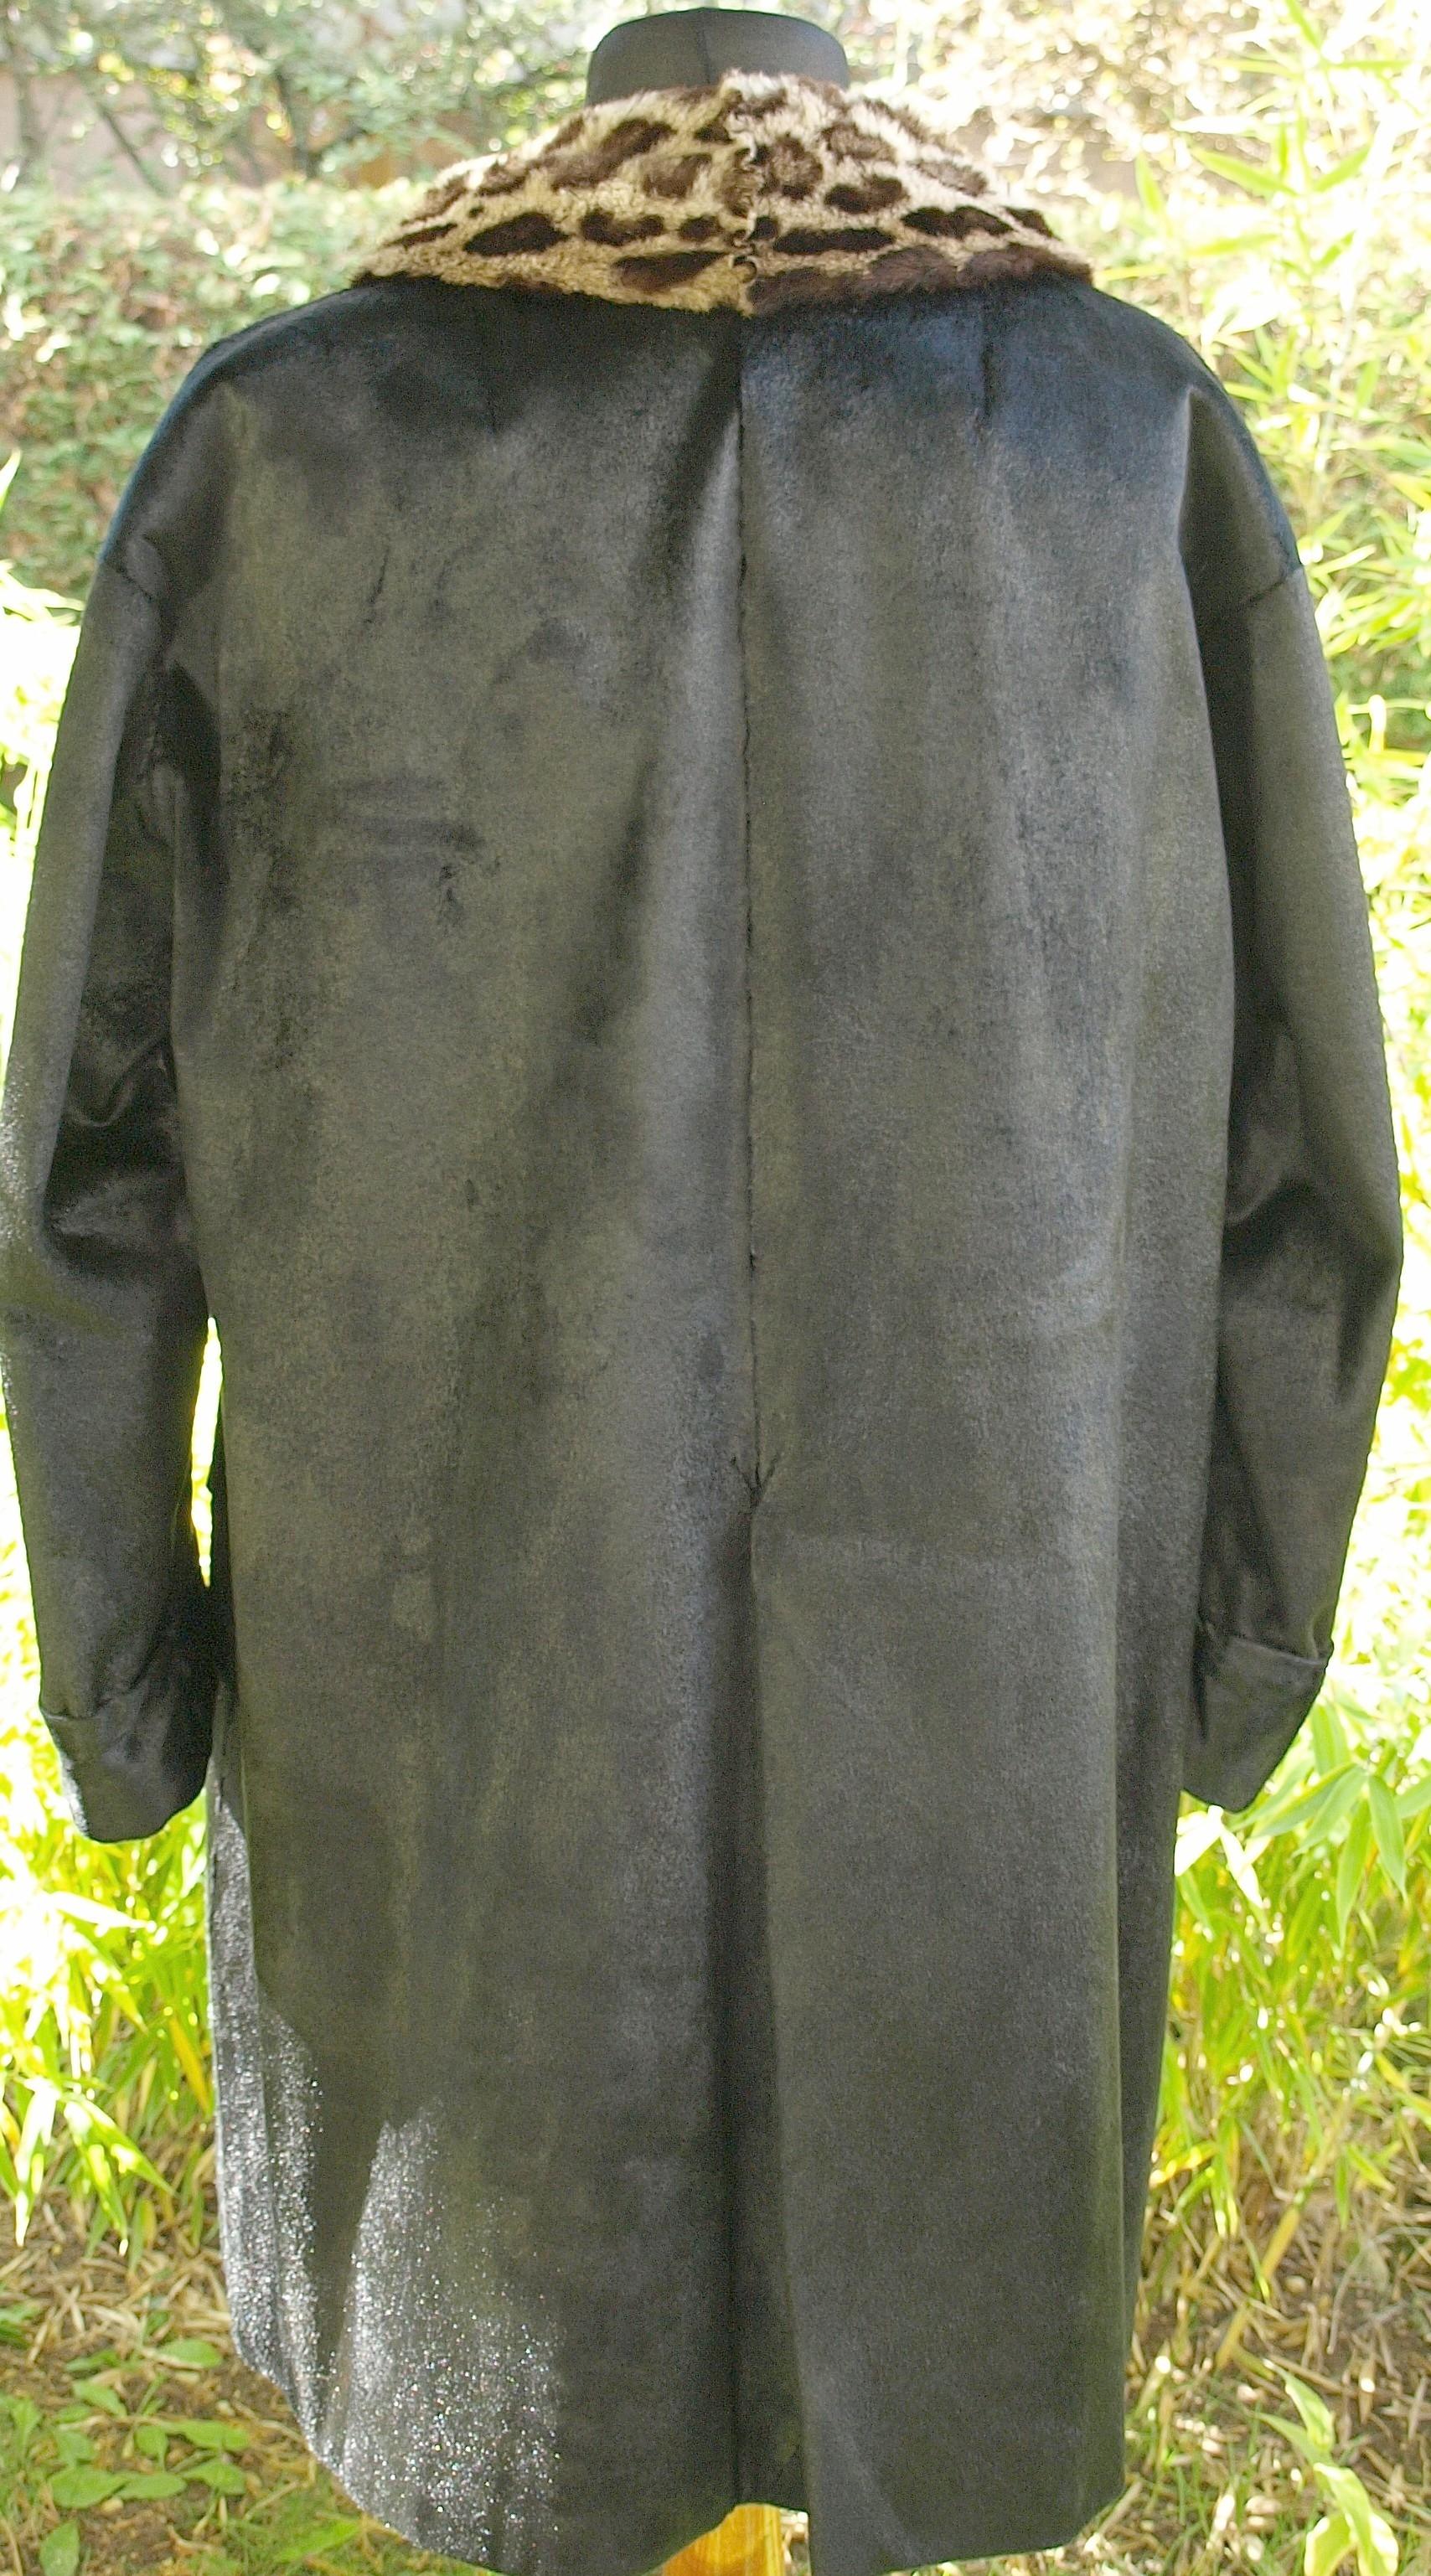 File:Lakoda Seal fur coat (6).jpg - Wikimedia Commons